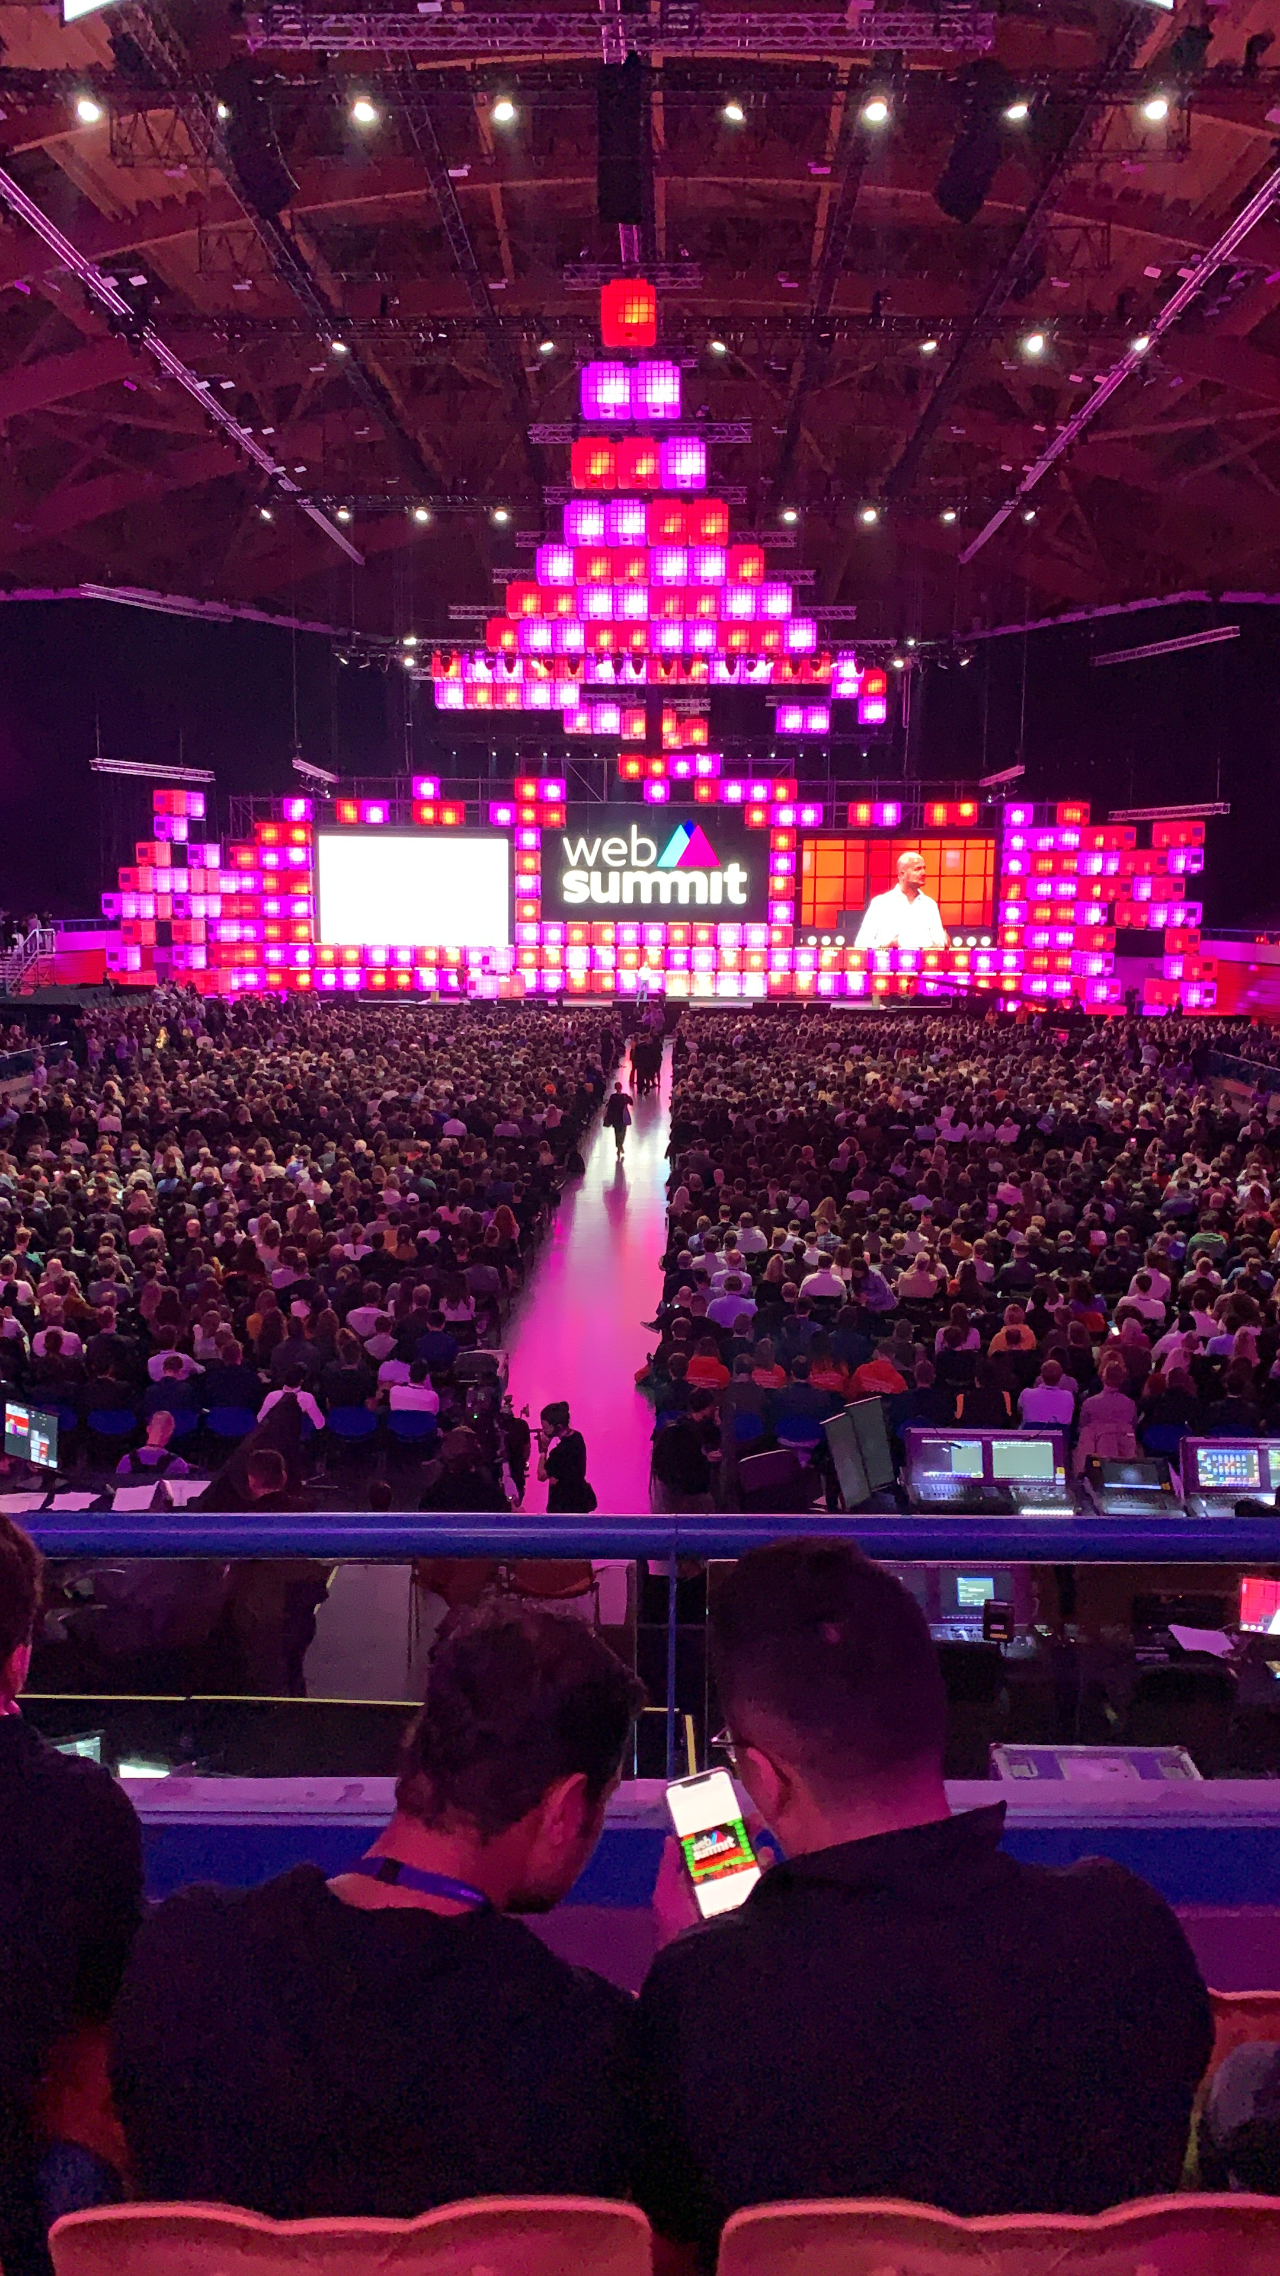 To Be Srl - Web Summit 2019 - Lisbona, Portogallo